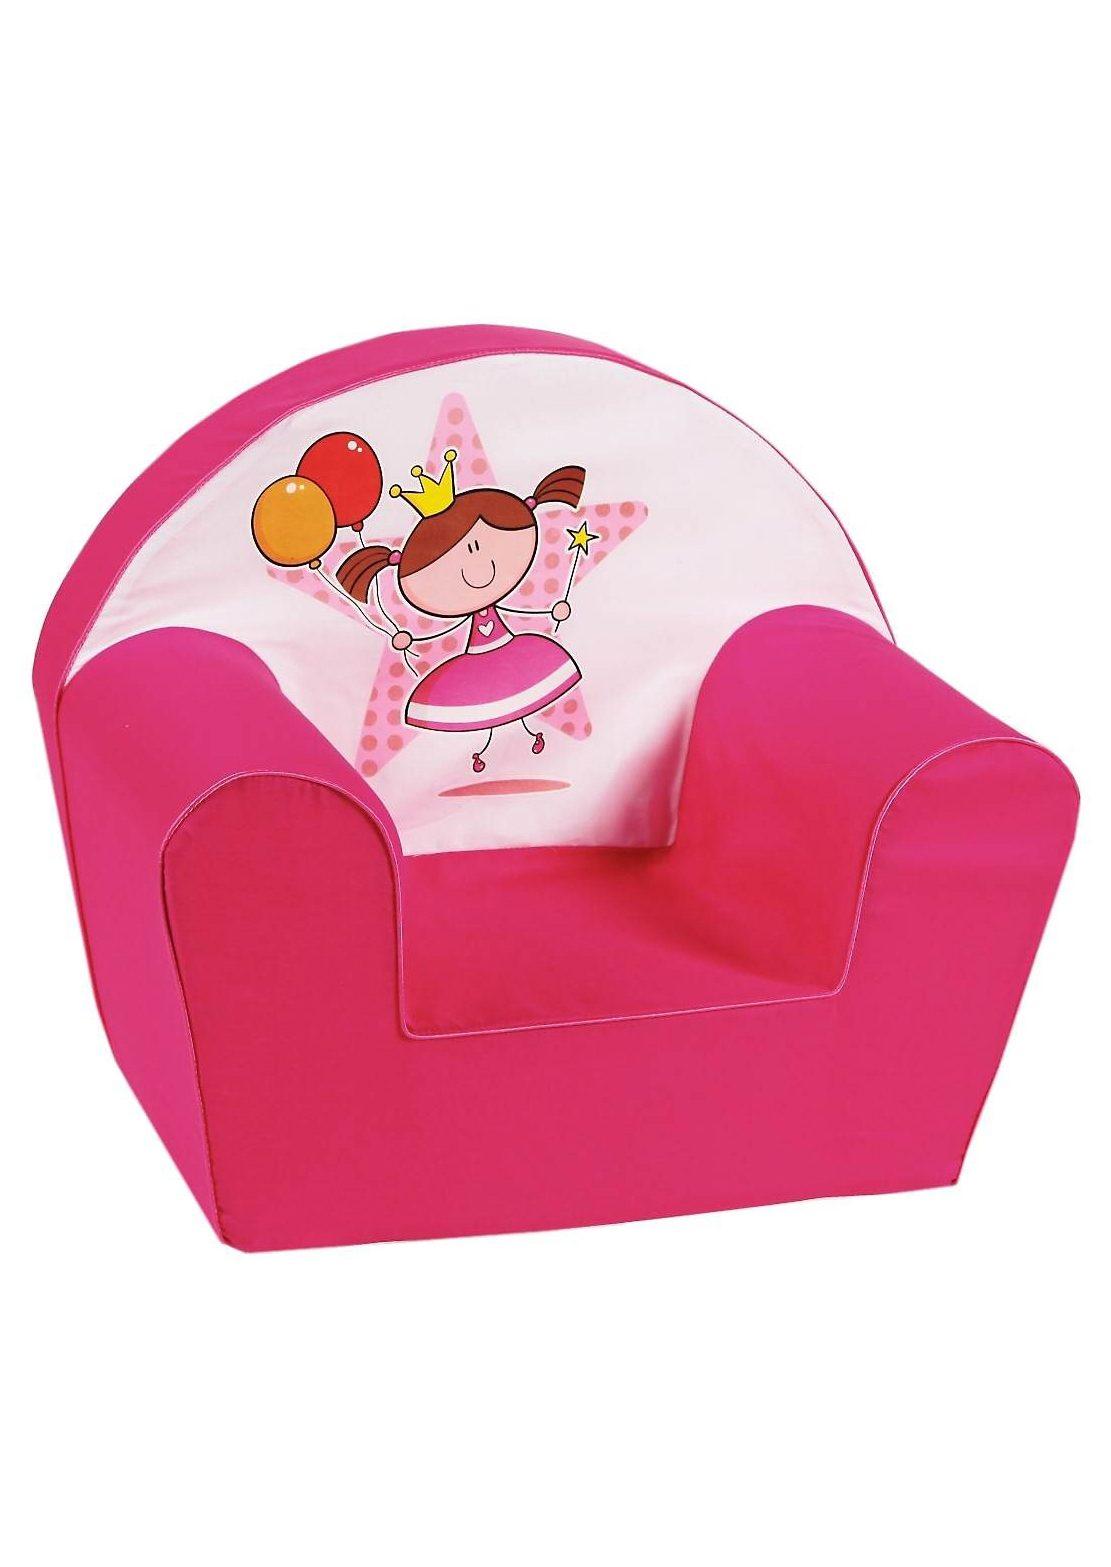 Kindersessel, »Princess Ballon«, knorr toys